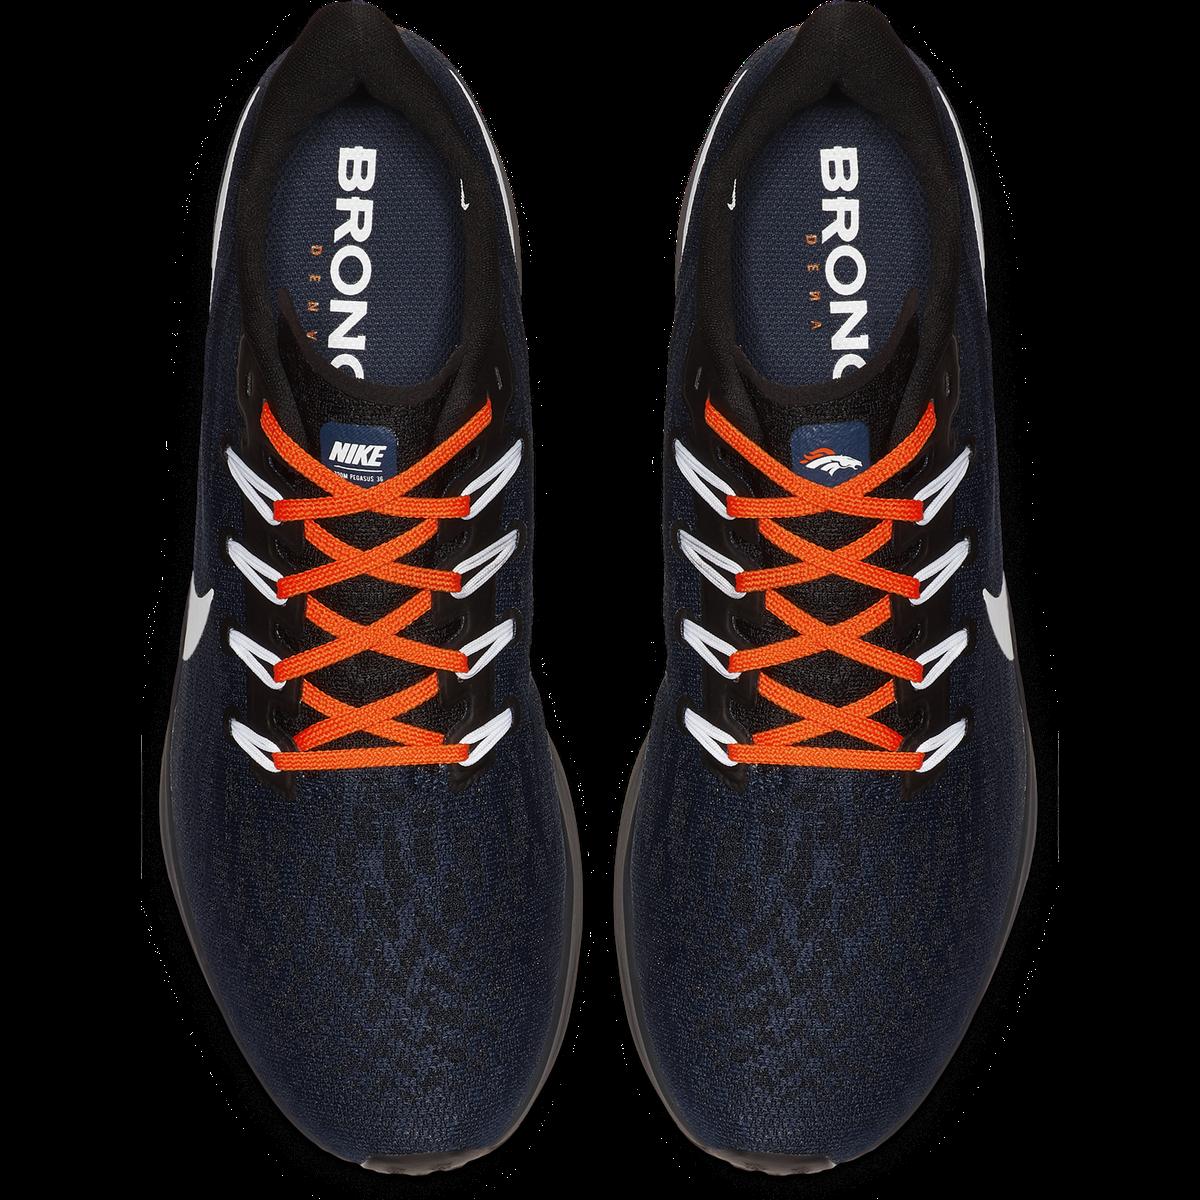 quality design 39156 4f112 Nike Air Zoom Pegasus 36 Denver Broncos shoe - Mile High Report